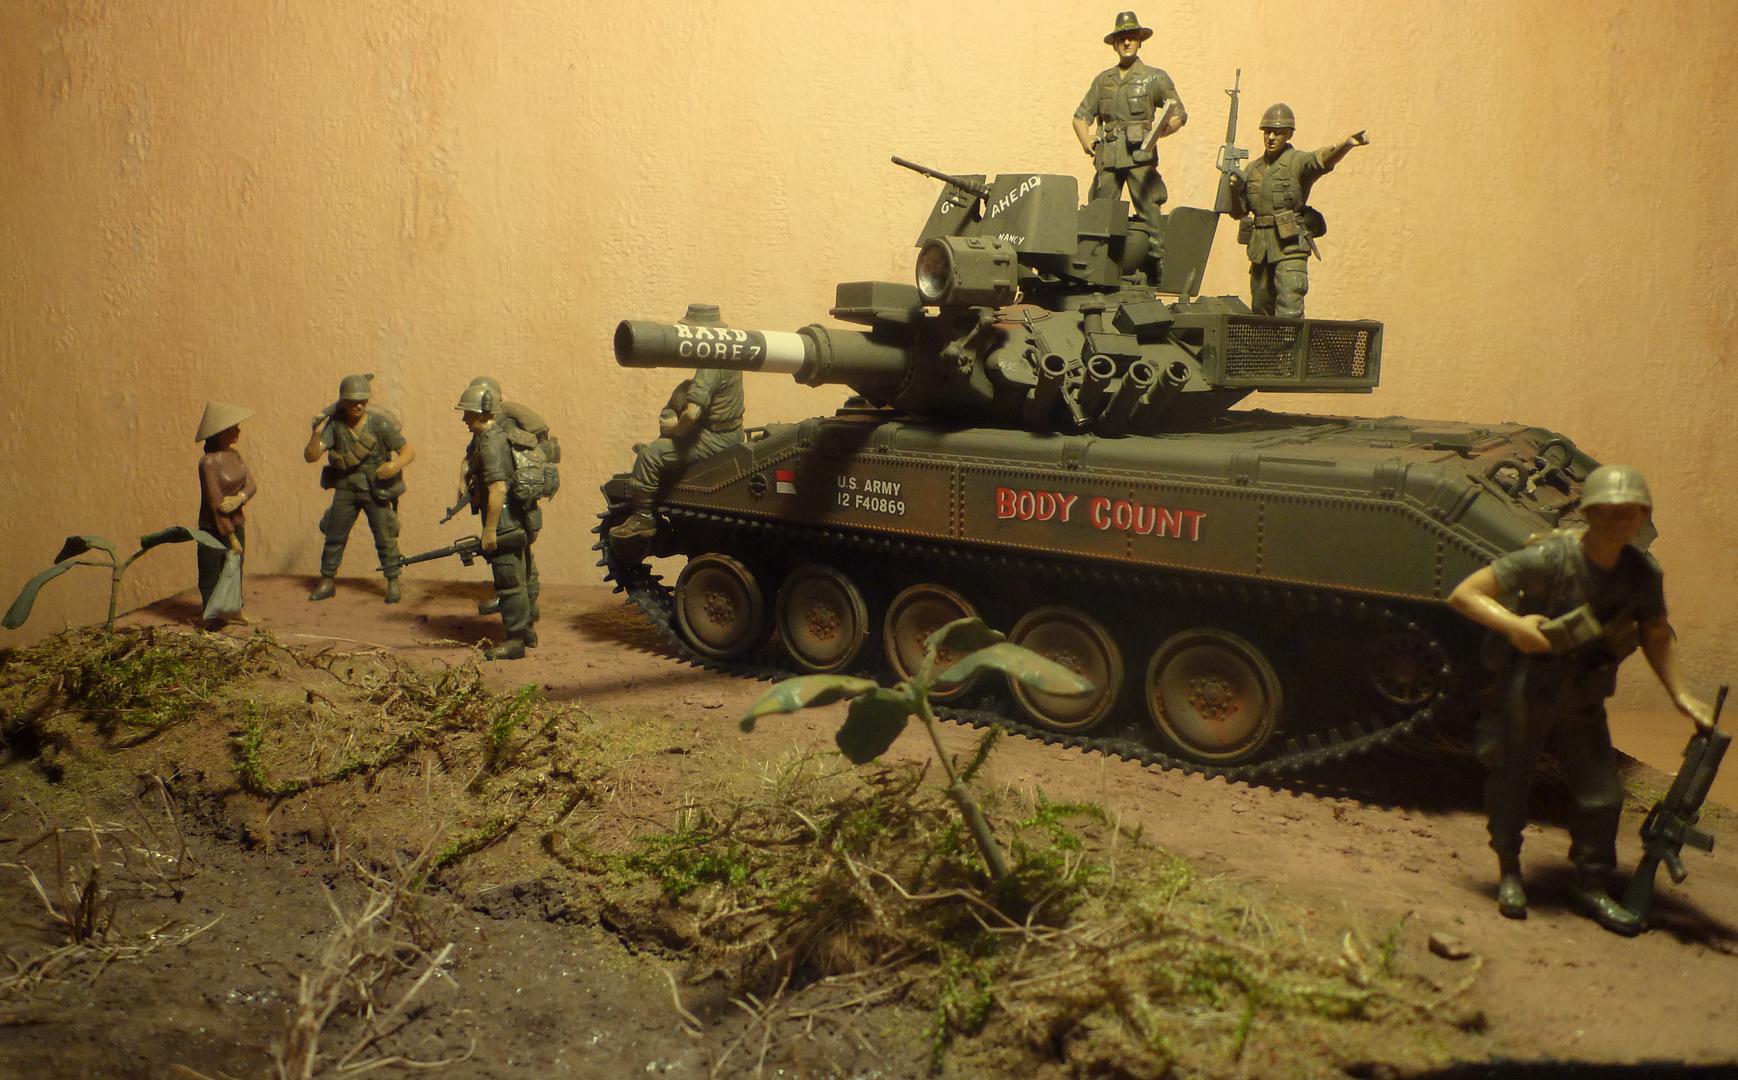 Vietnam-Krieg 1971 - Sheridan 551 Airborne tank